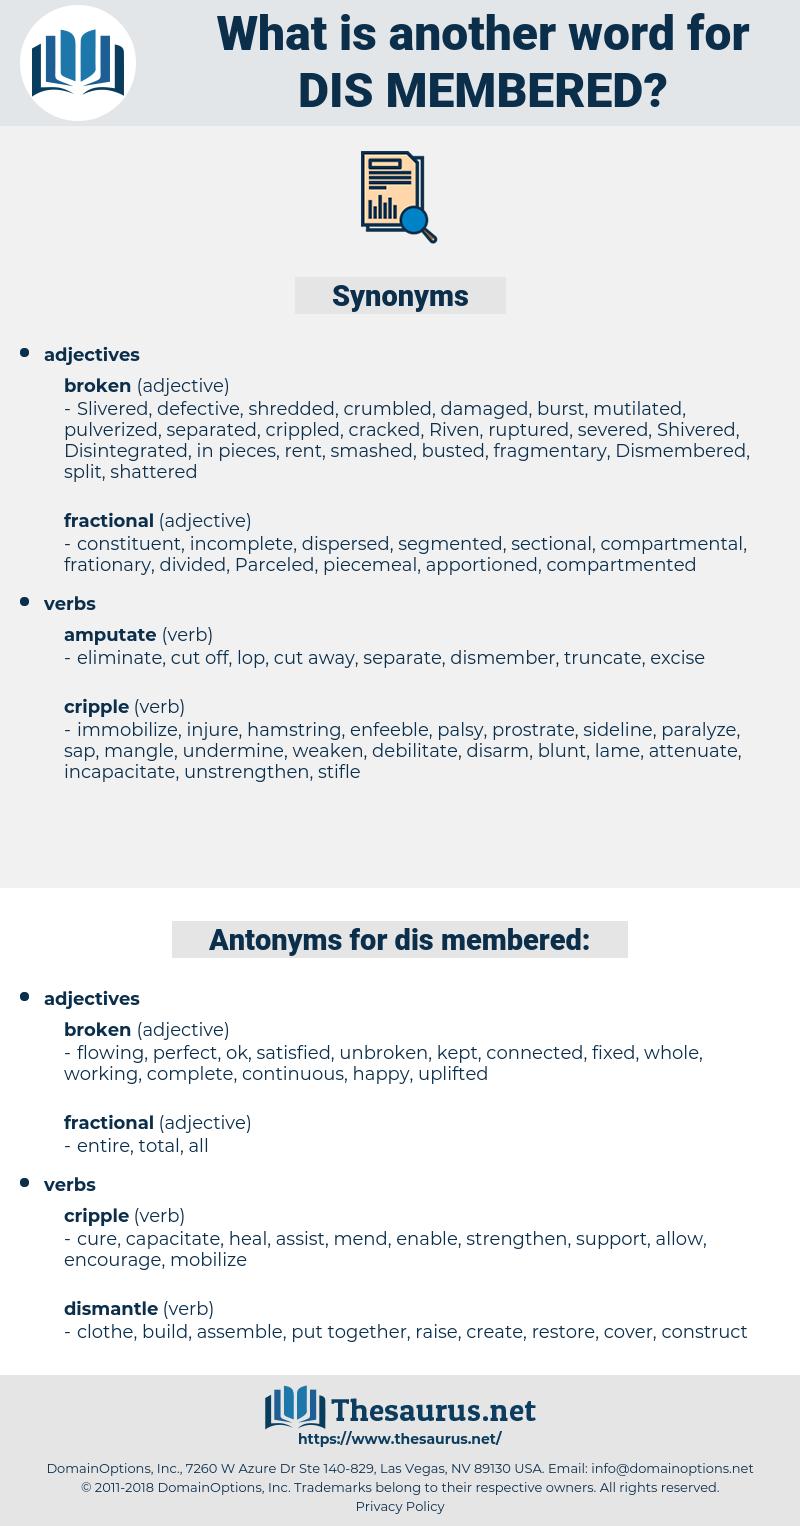 dis-membered, synonym dis-membered, another word for dis-membered, words like dis-membered, thesaurus dis-membered